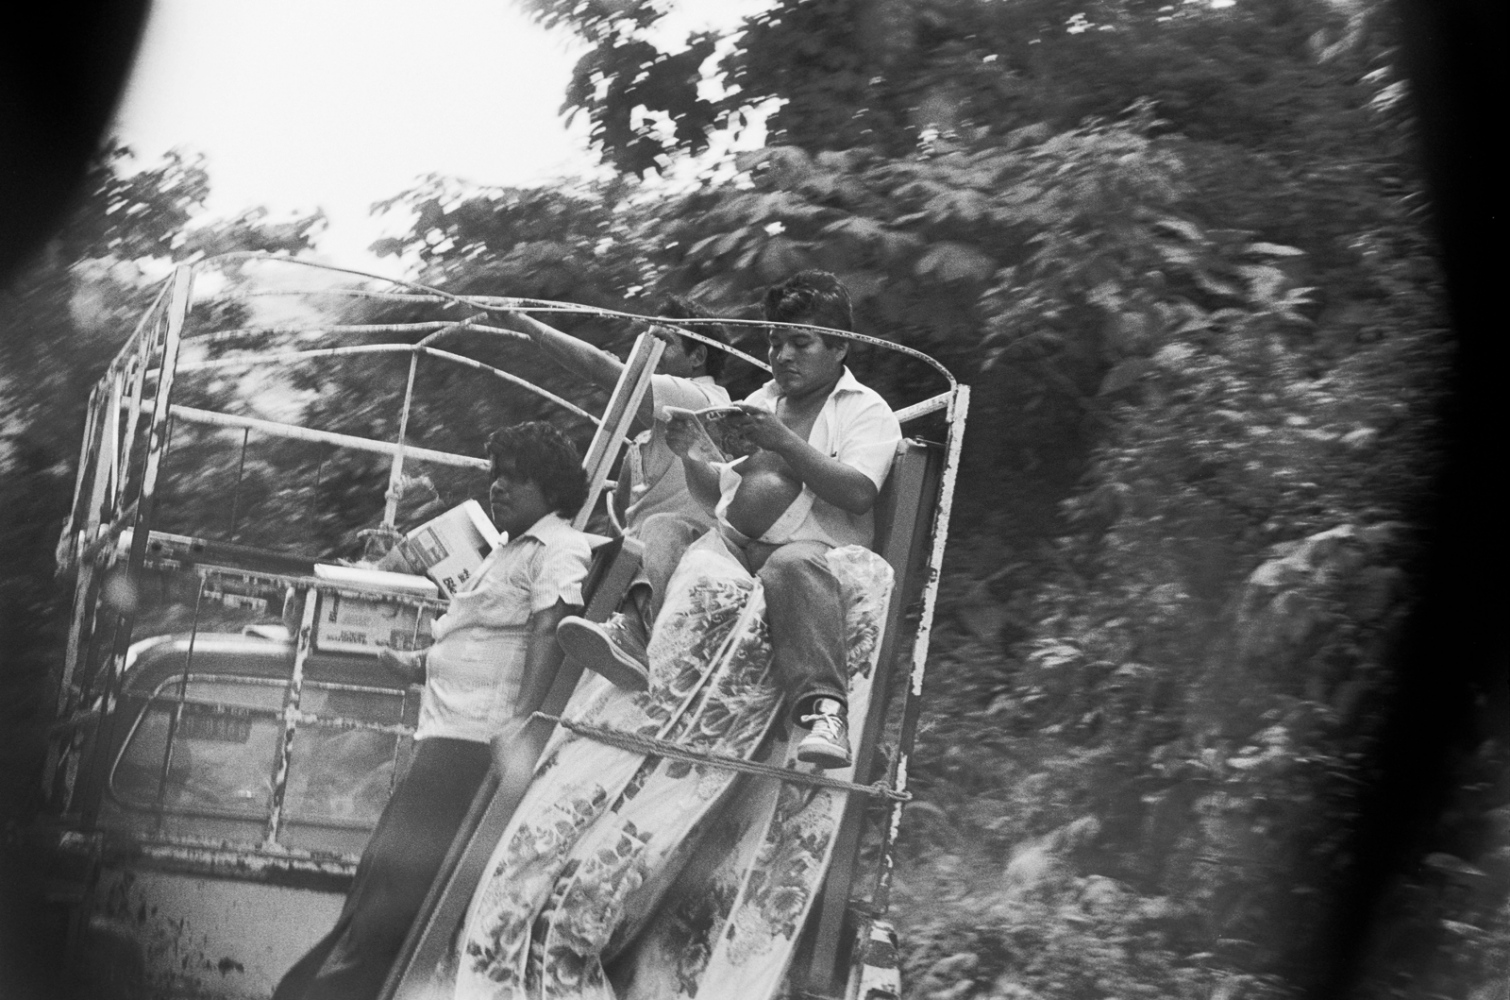 Art and Documentary Photography - Loading Camino_a_Ozuluama88__sdeswaan.jpg